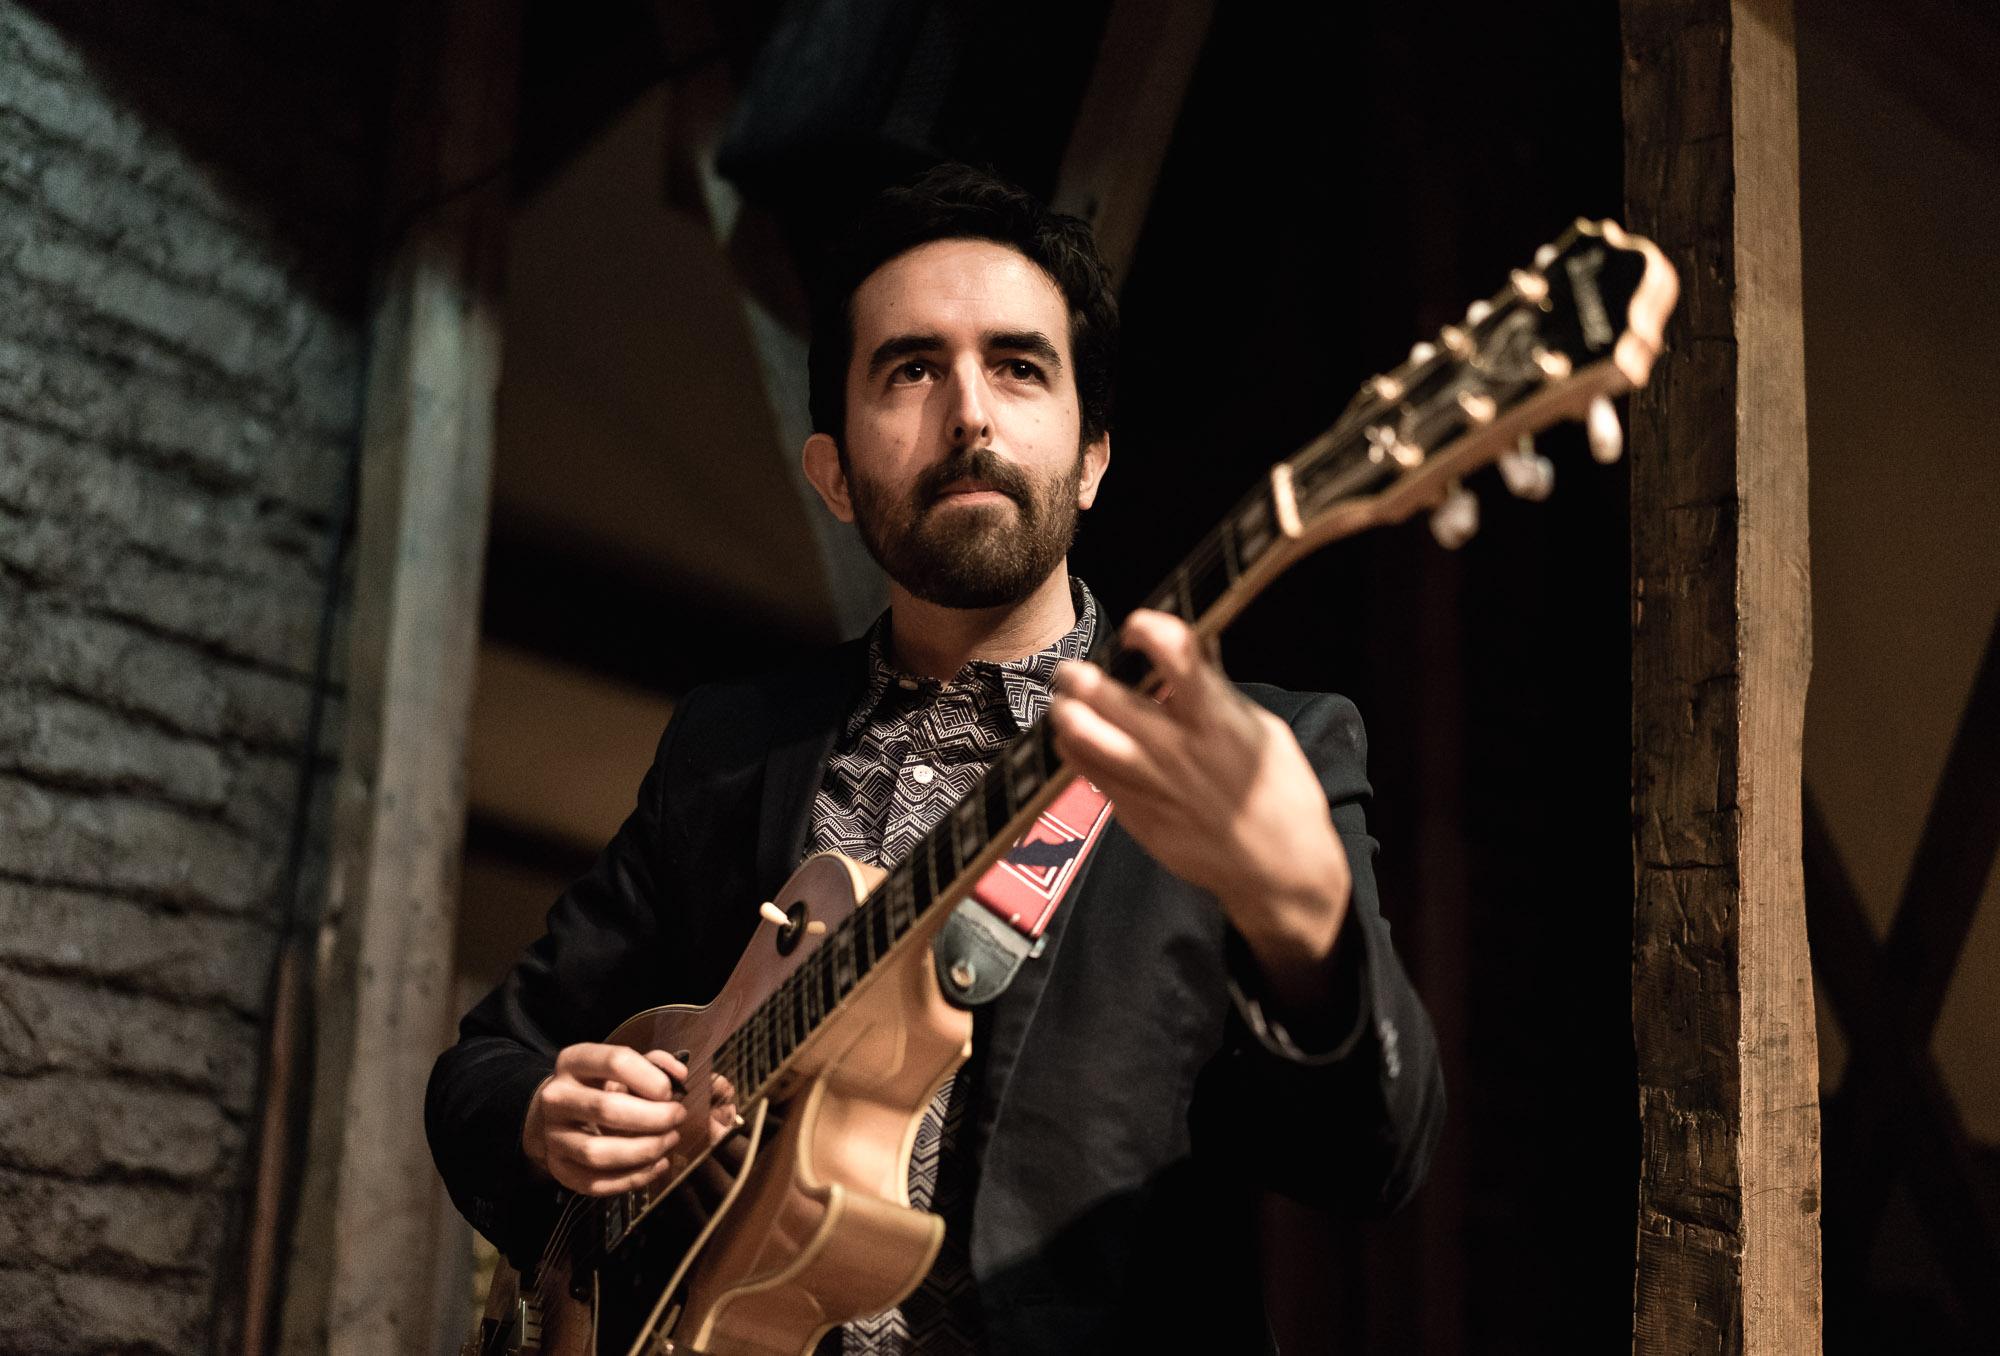 Felipe Duhart Cuarteto Thelonious 3 Junio 2017(GFC_4811)_(2000px)Web.jpg